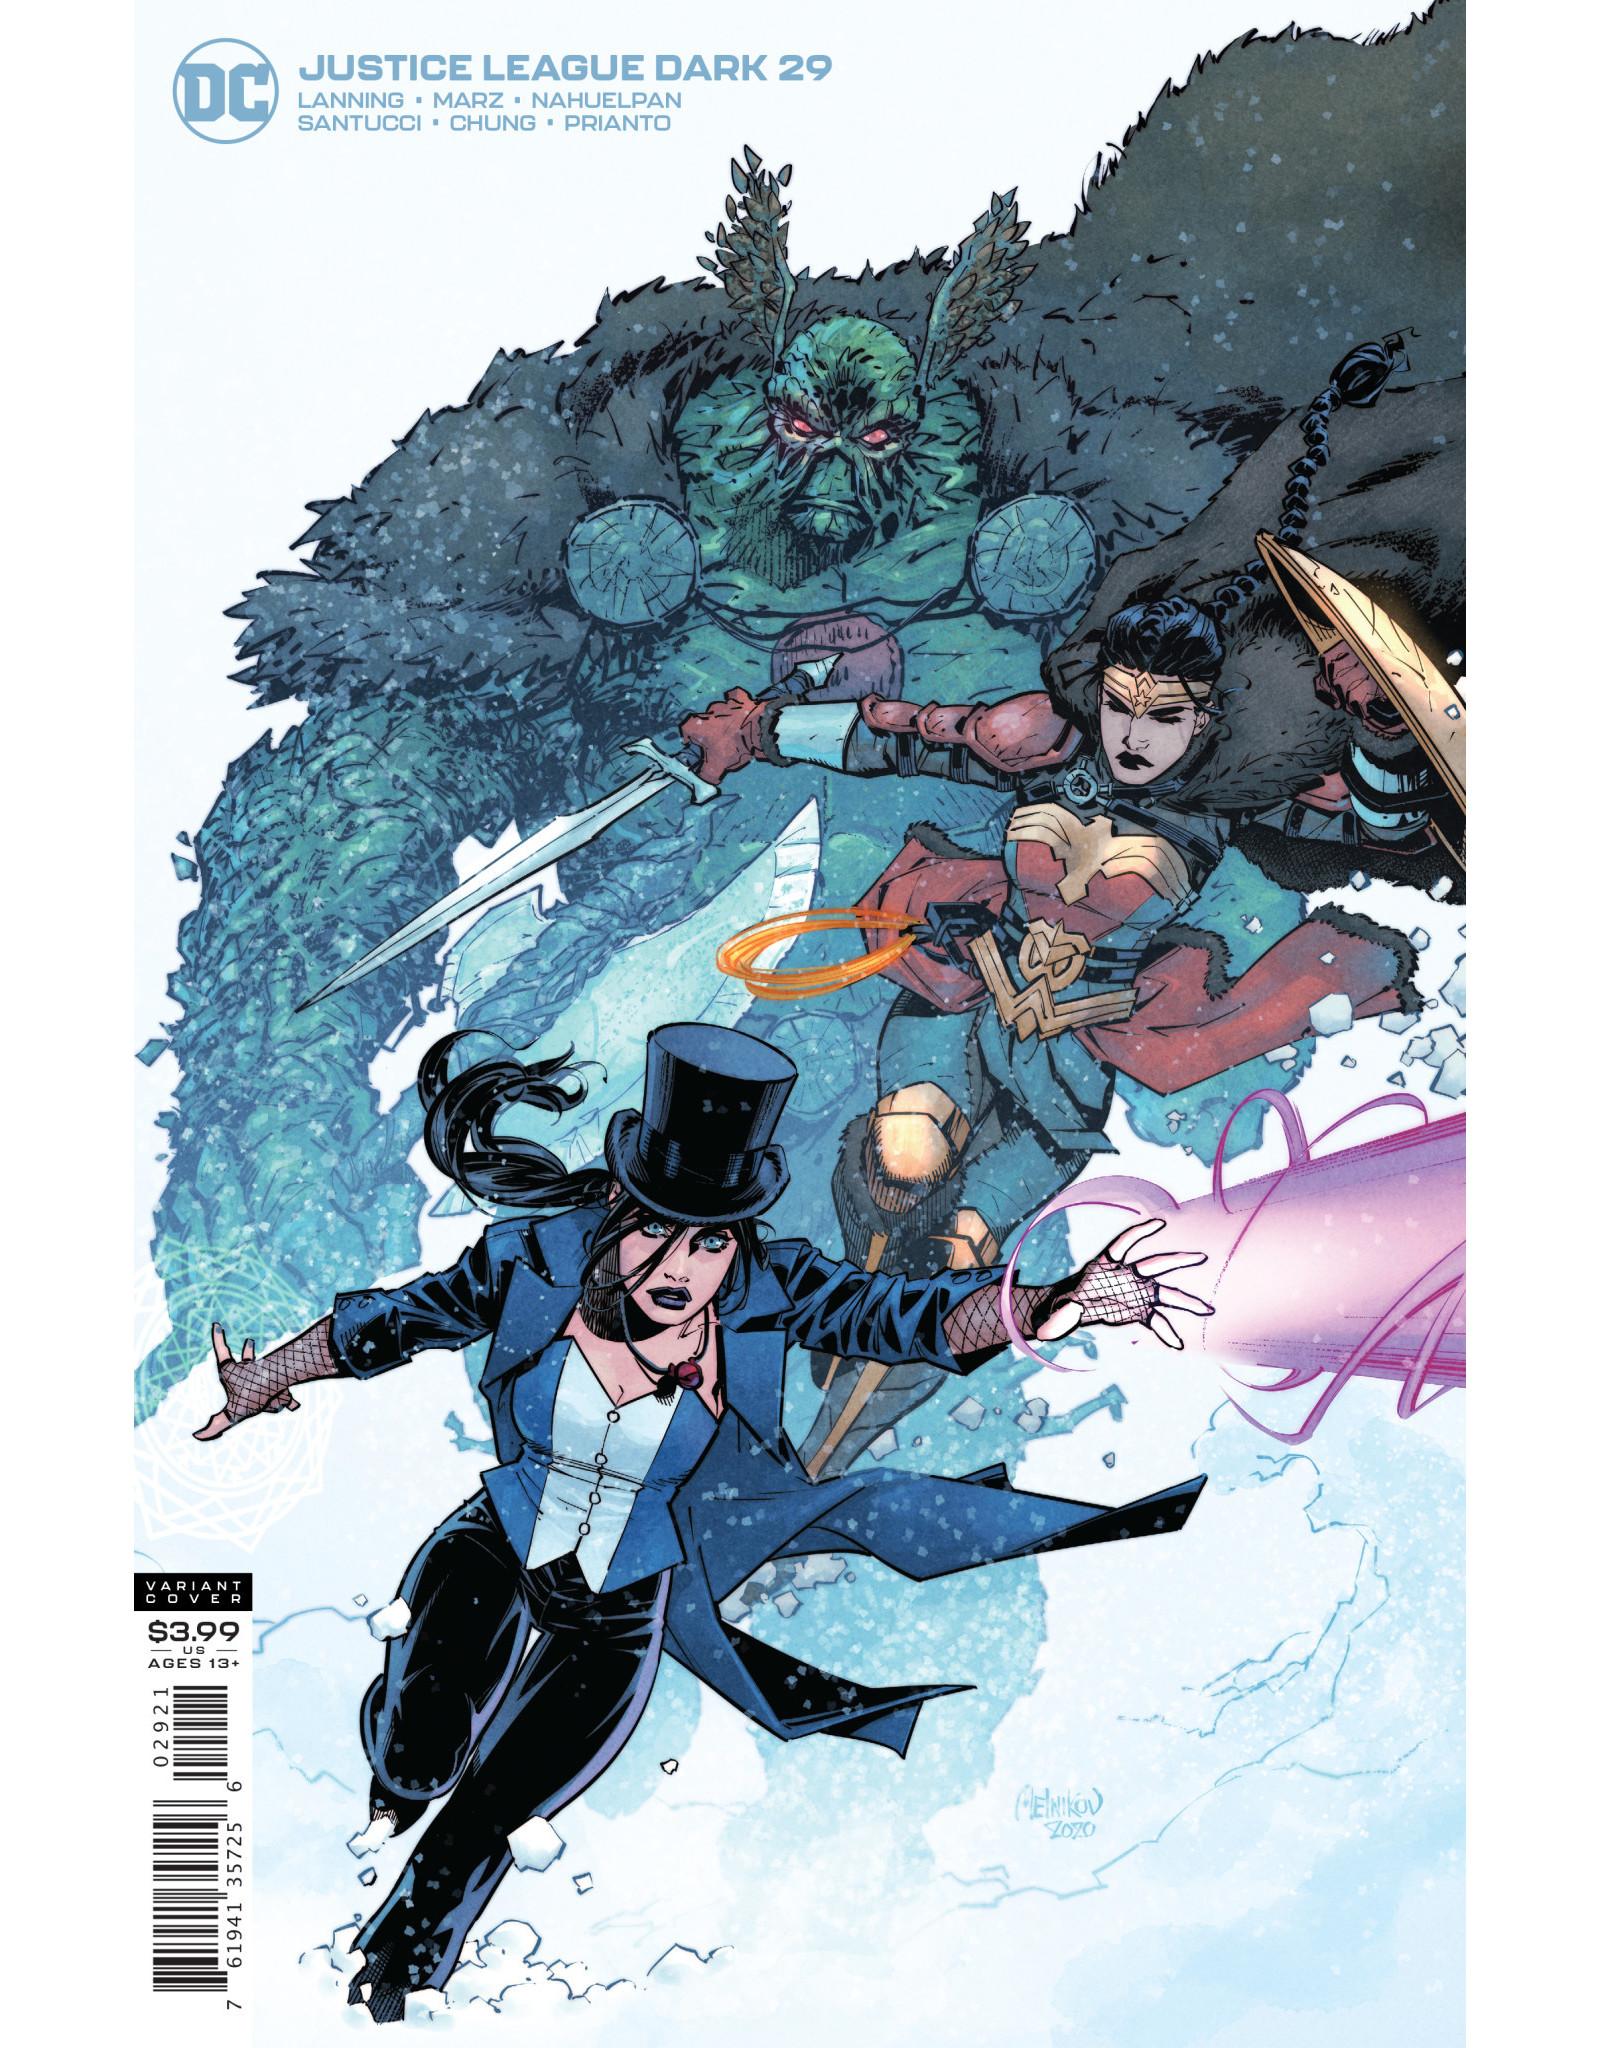 DC Comics JUSTICE LEAGUE DARK #29 CVR B GLEB MELNIKOV VAR (ENDLESS WINTER)